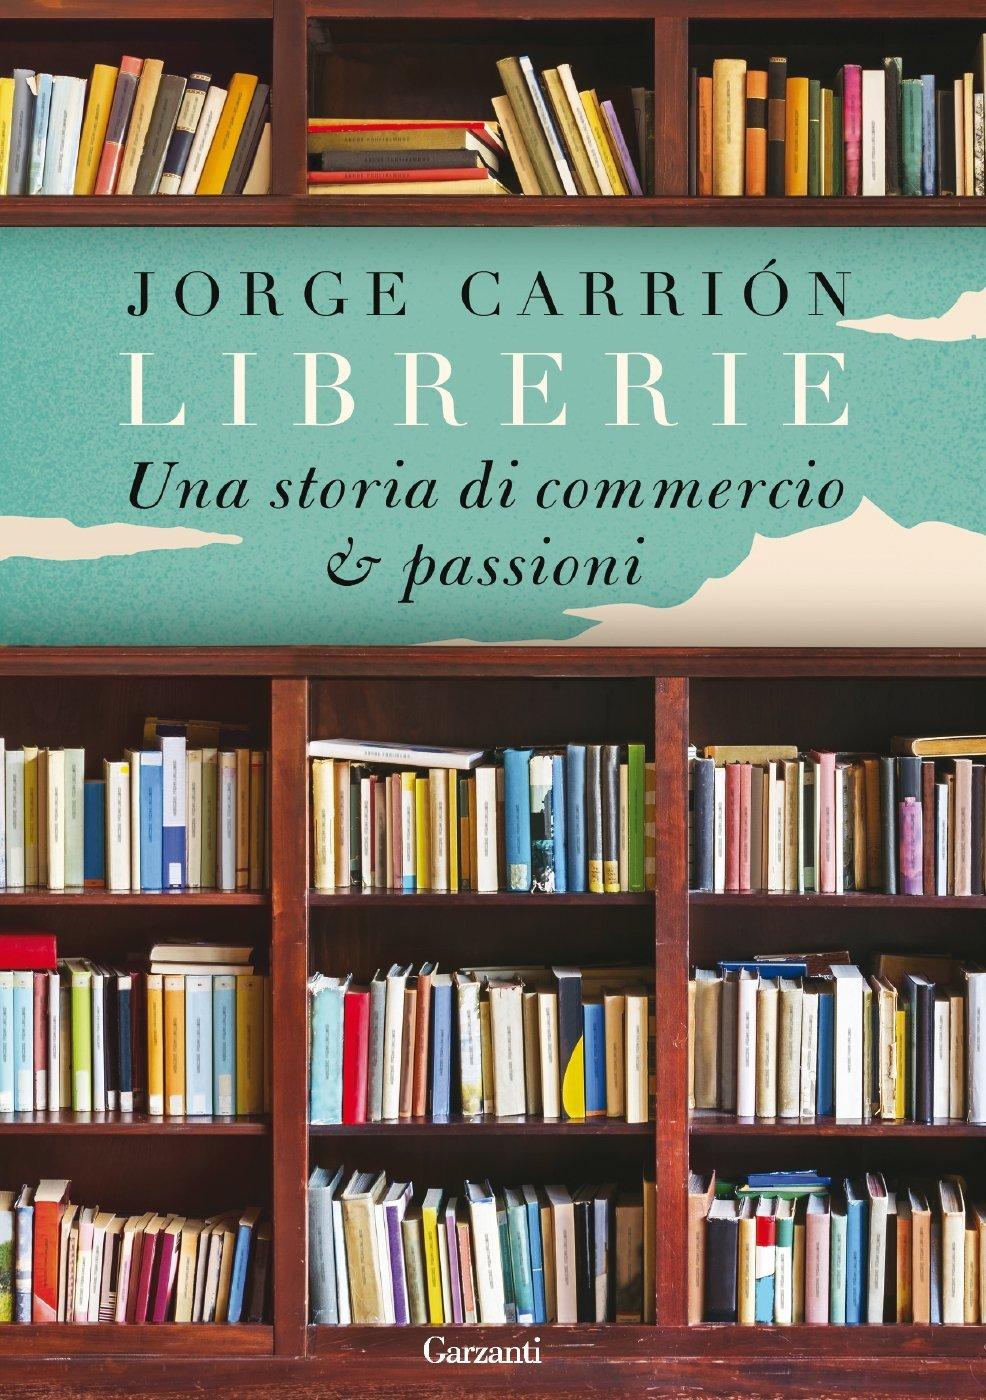 Jorge Carrion Llibrerie